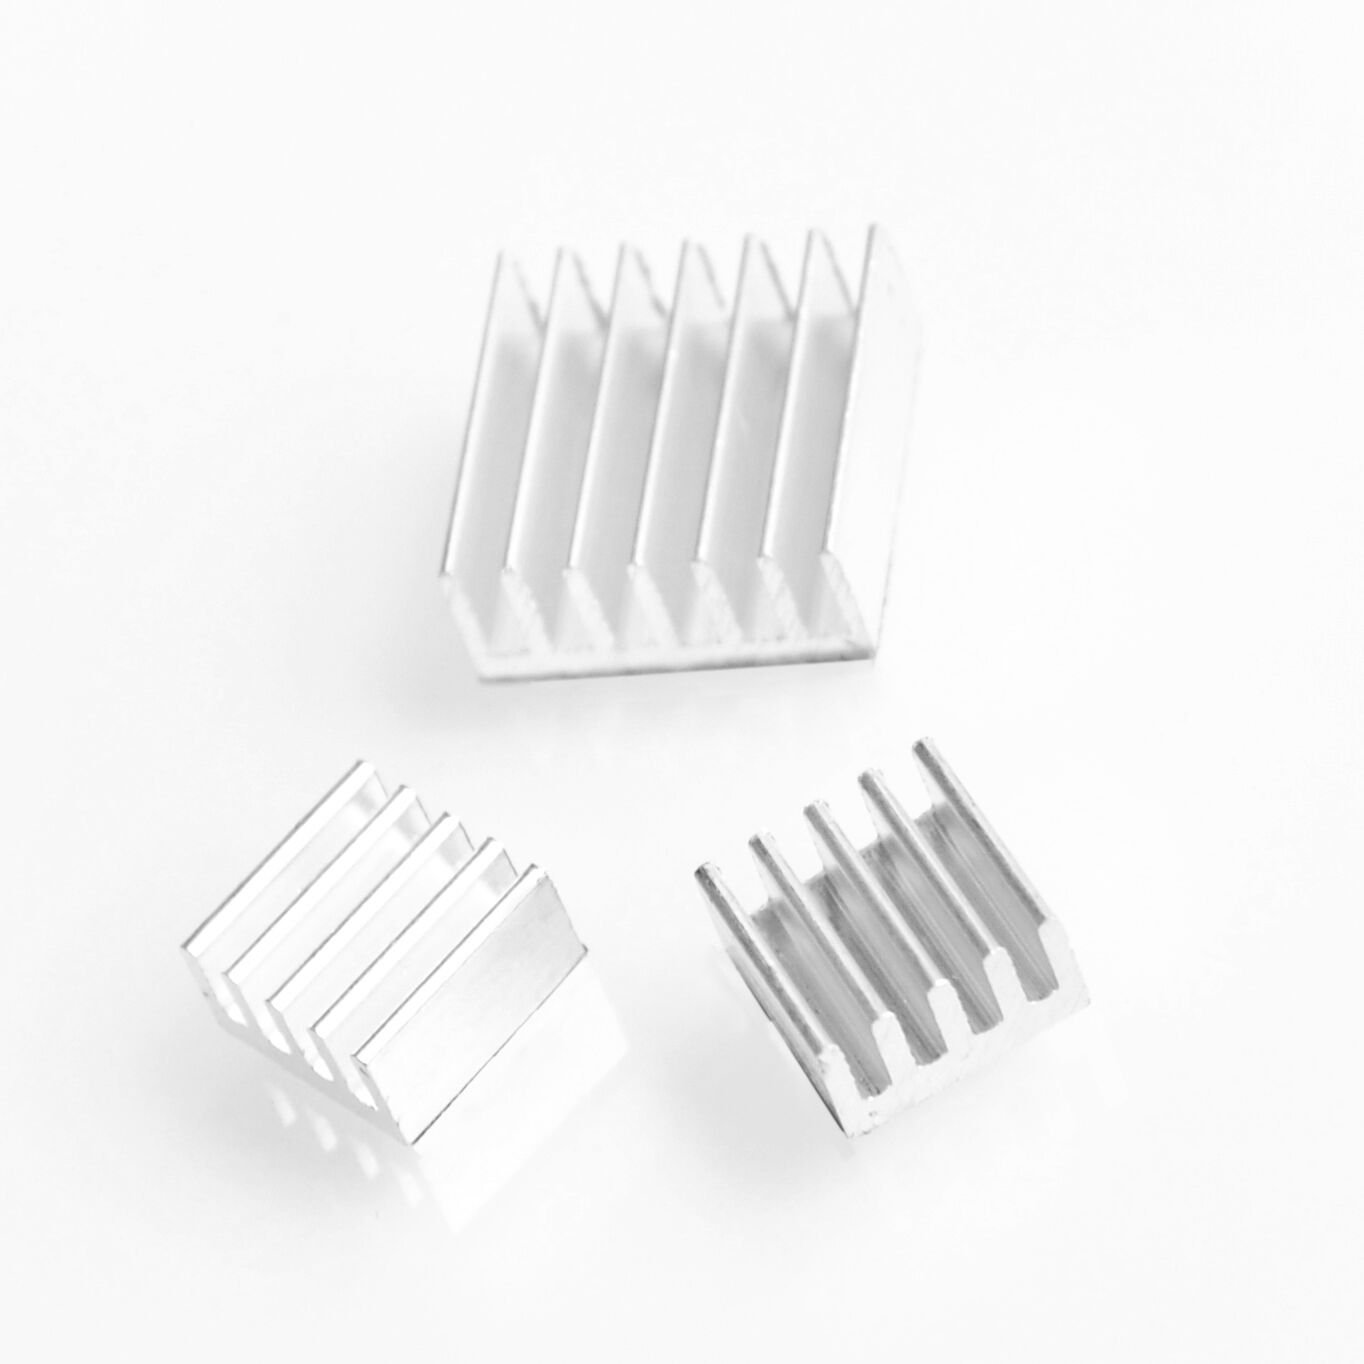 3pcs Adhesive Raspberry Pi 3 Heatsink Cooler Pure Aluminum Heat Sink Set Kit Radiator for Cooling Raspberry Pi 2 B